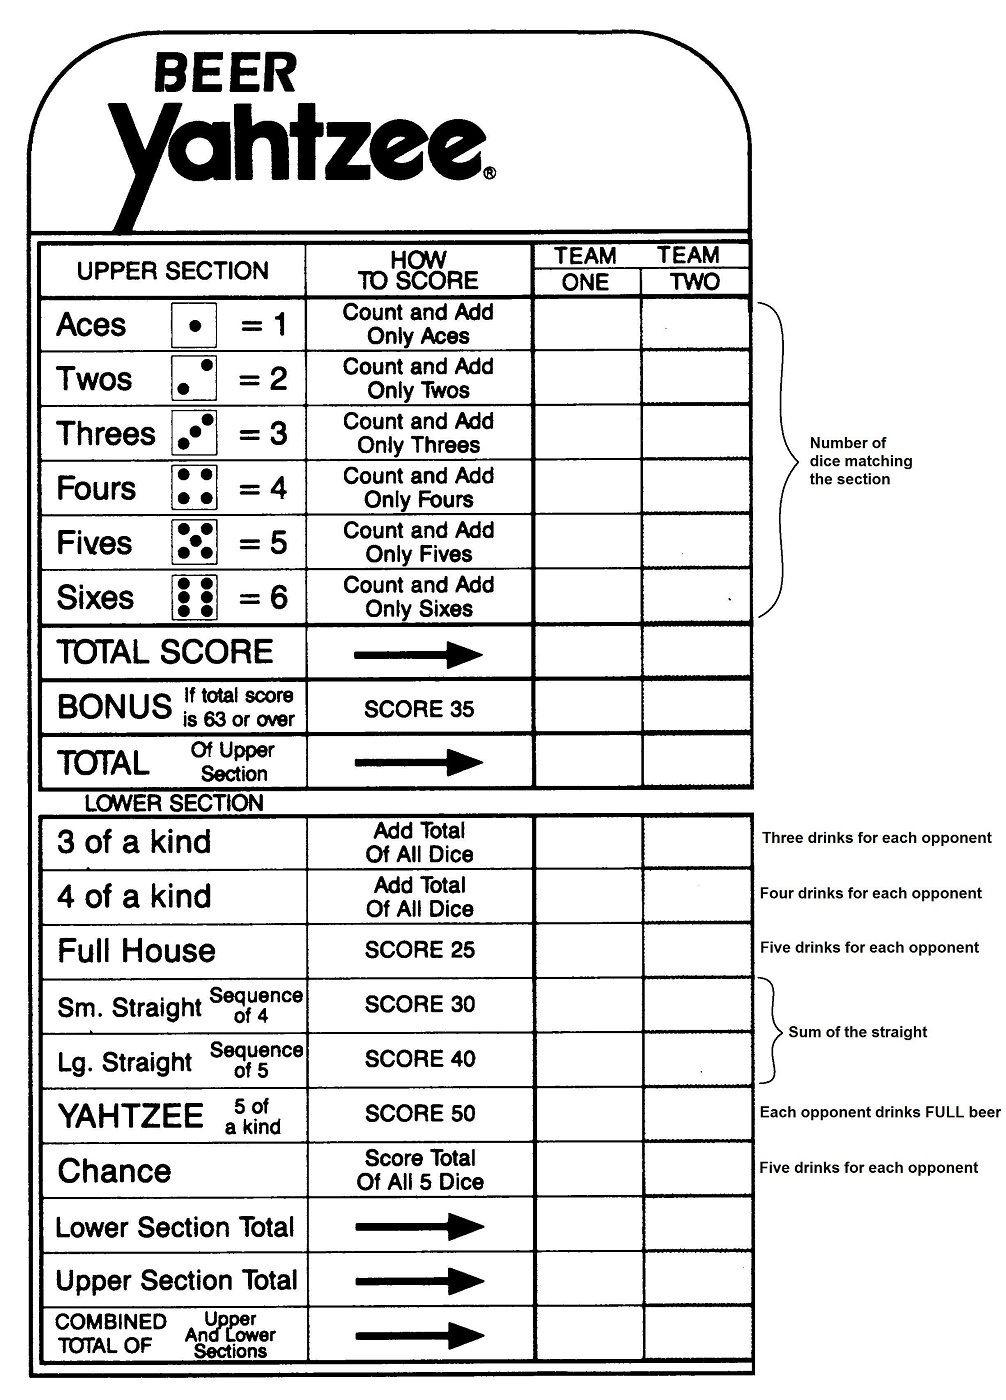 Yahtzee Score Sheets Printable | Yahtzee Score Sheets | Yahtzee - Free Printable Yahtzee Score Sheets